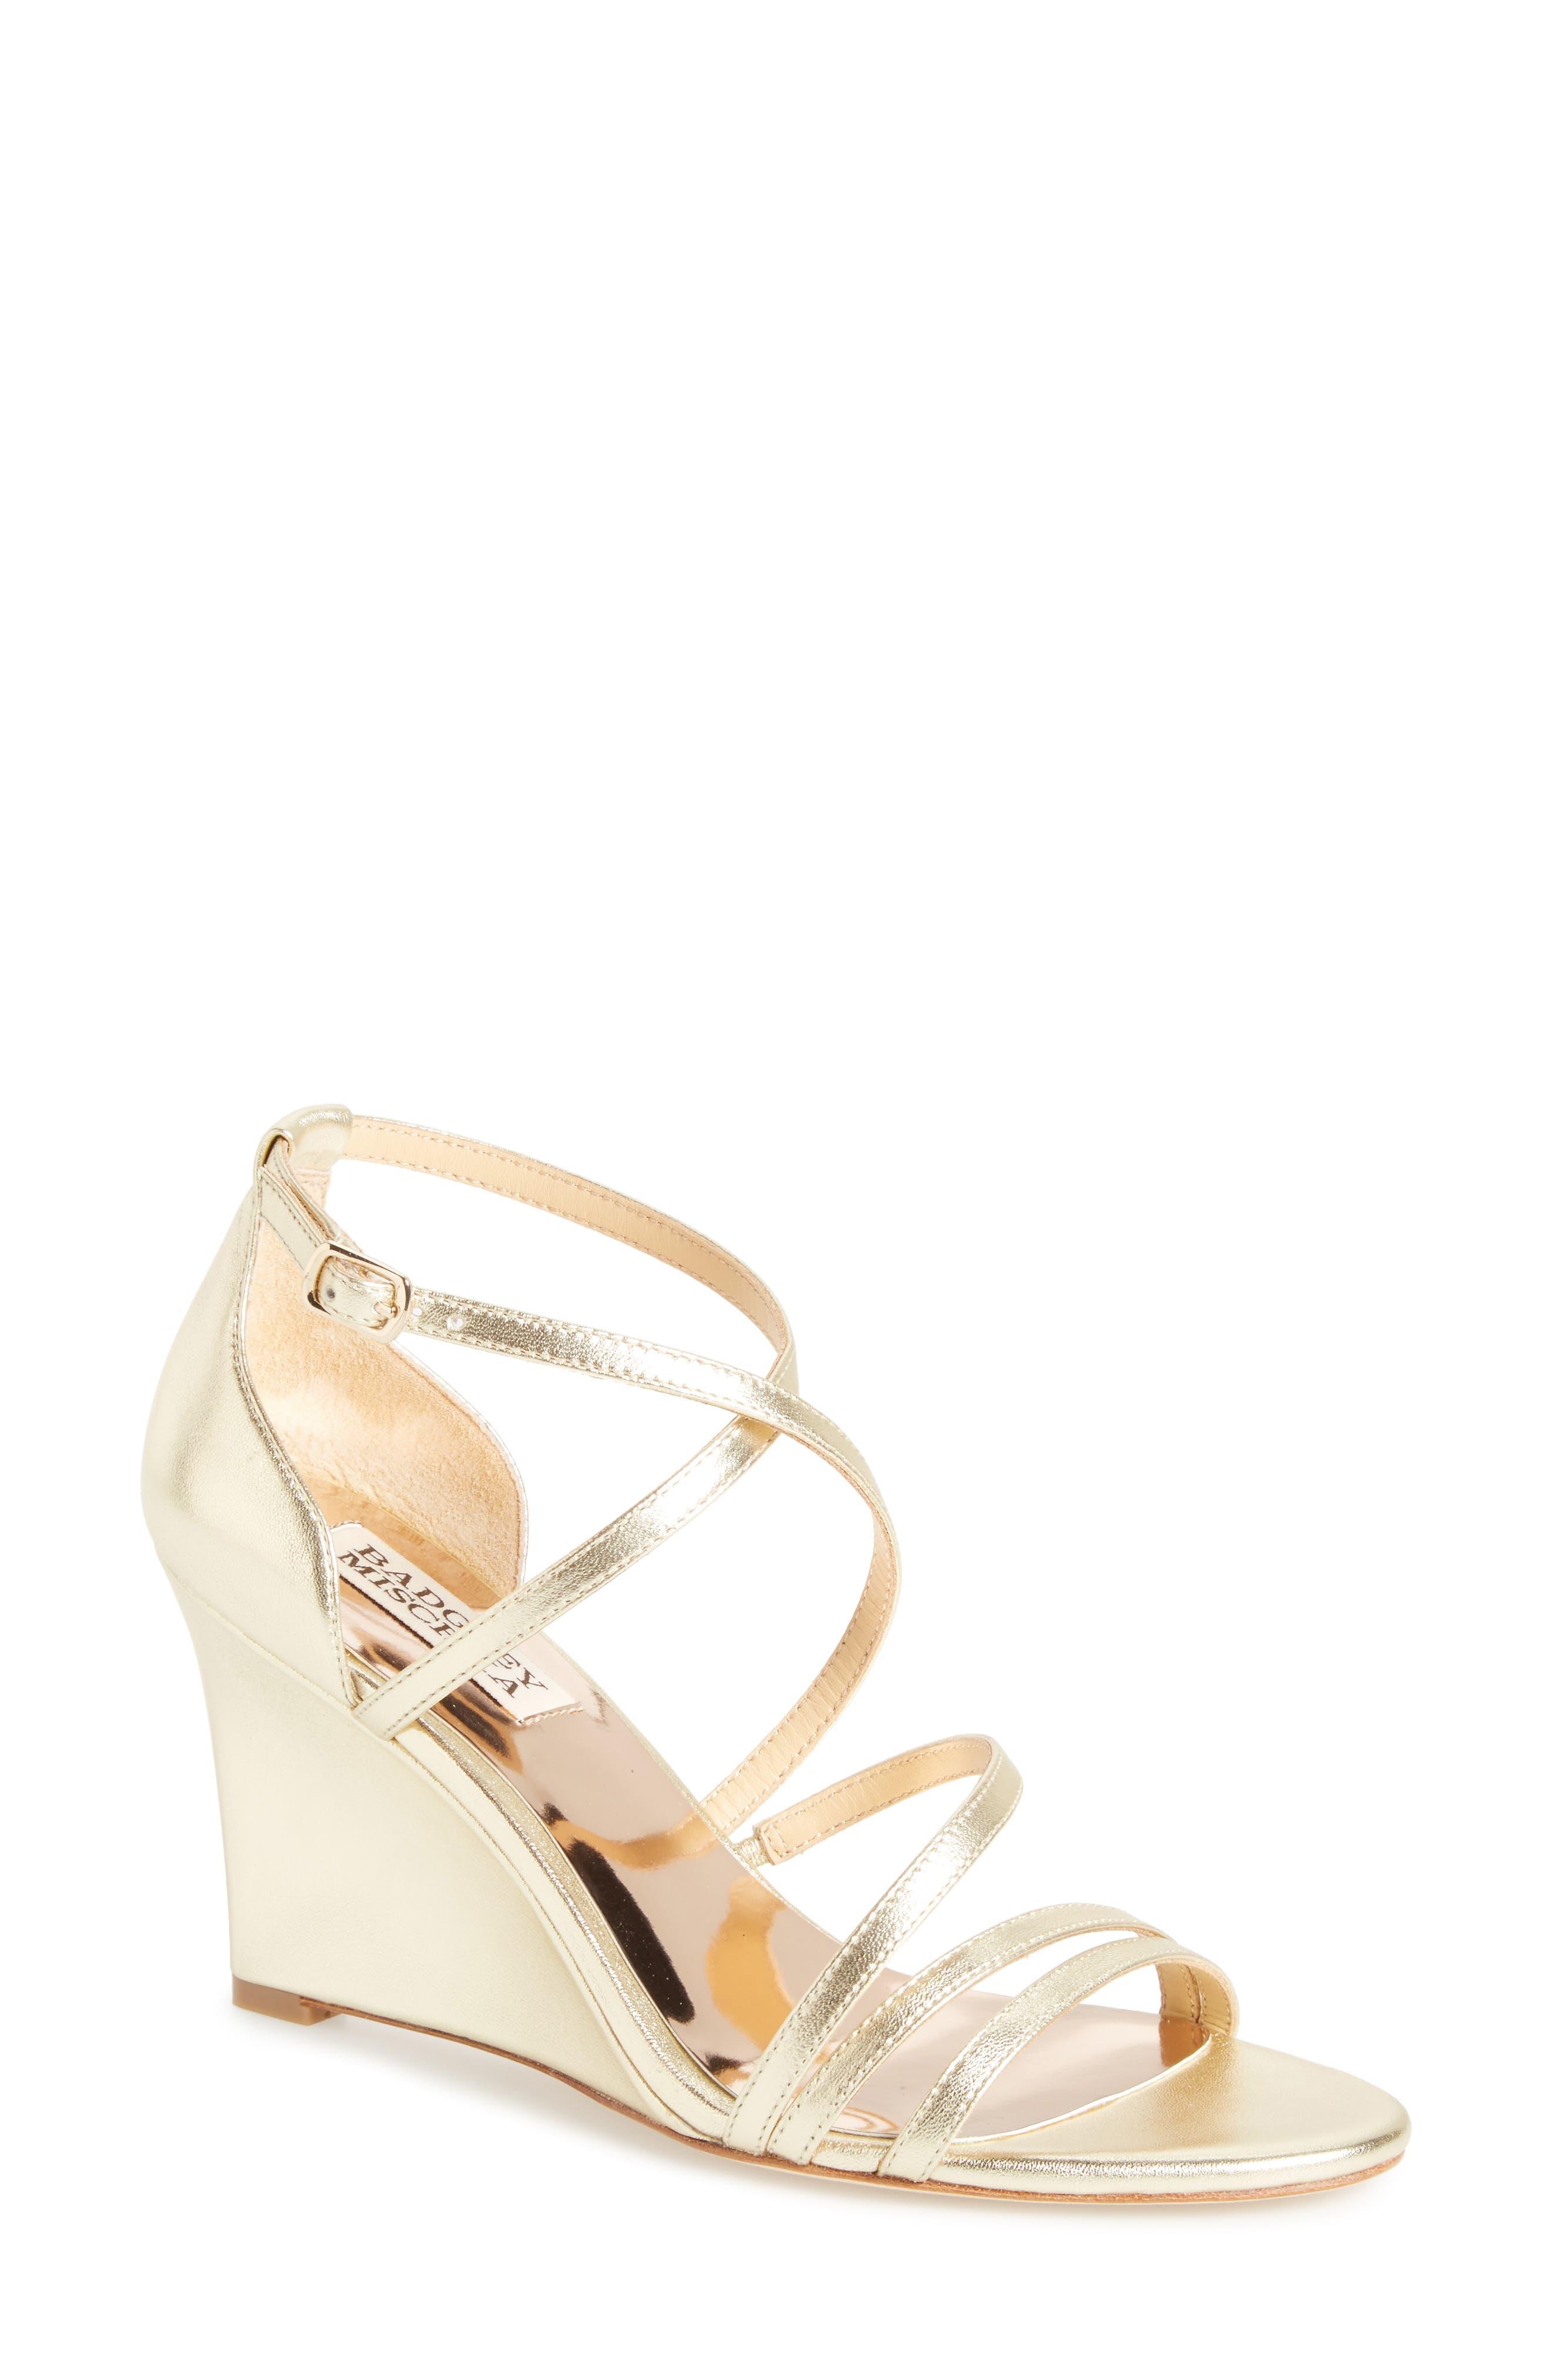 Main Image - Badgley Mischka Bonanza Strappy Wedge Sandal (Women)